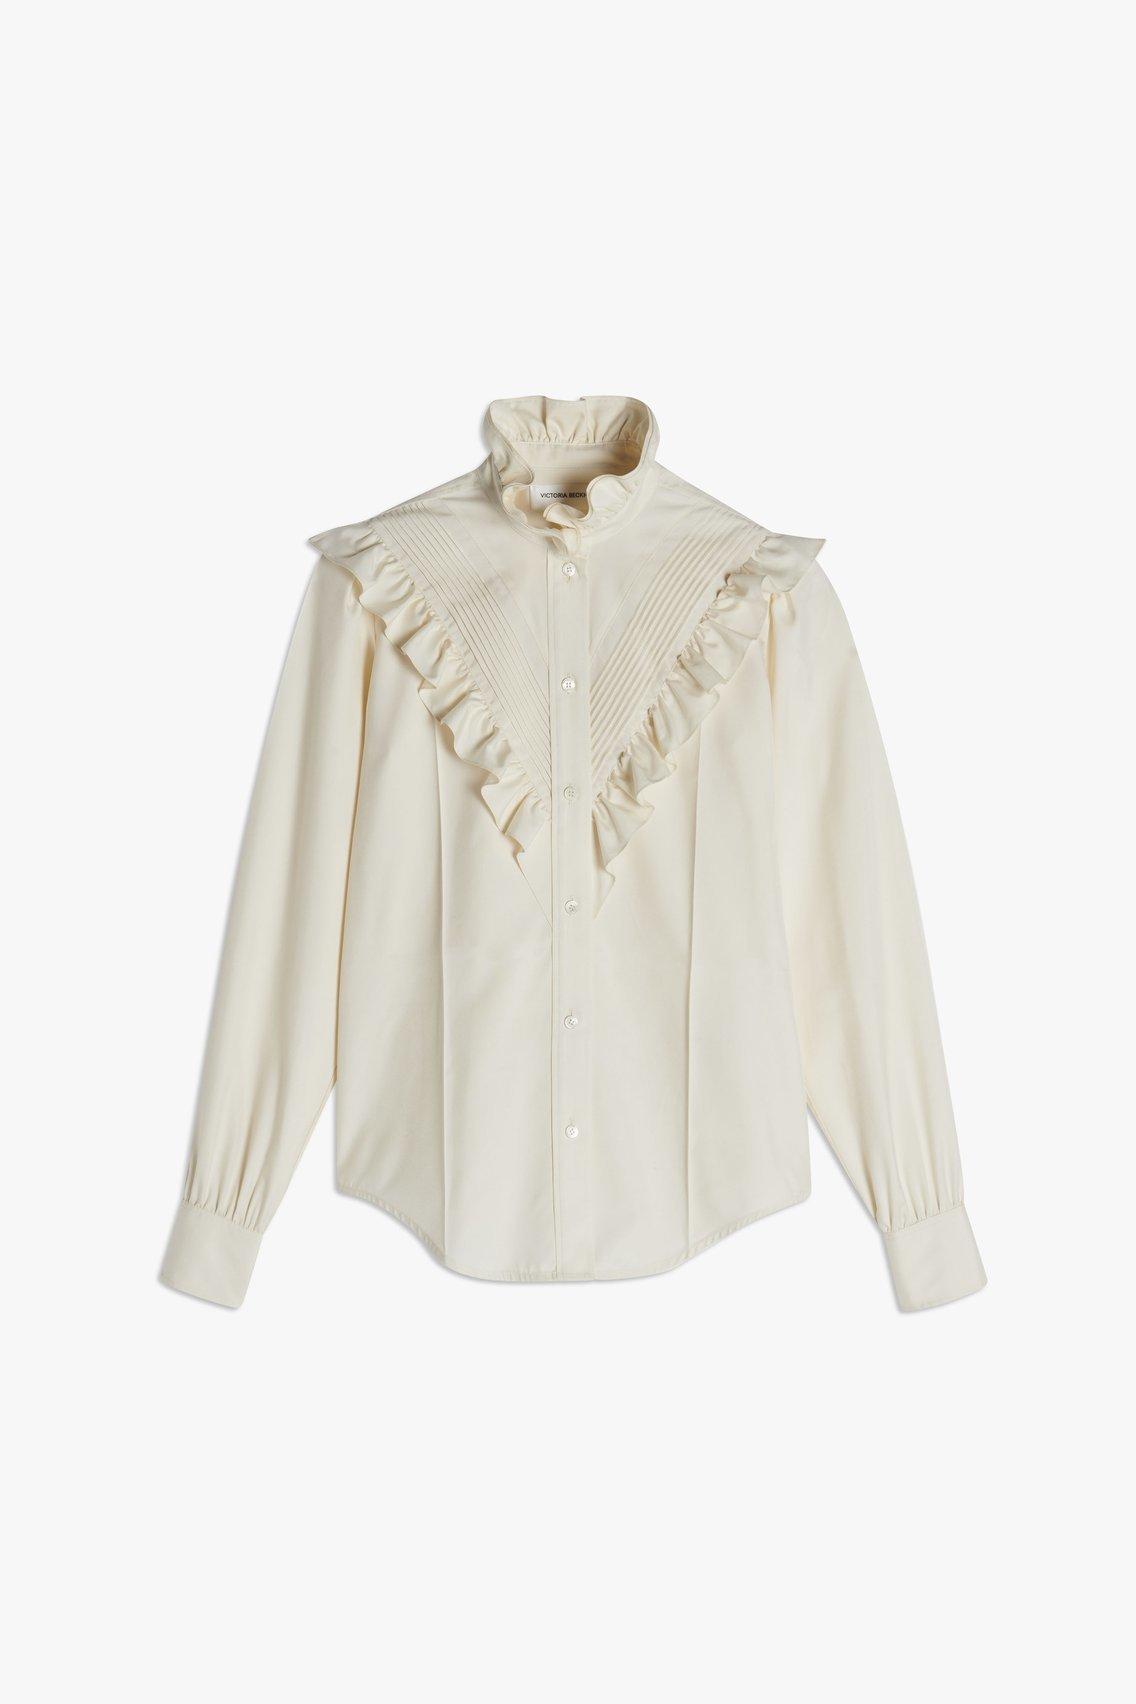 Camisa de seda, de Victoria Beckham.